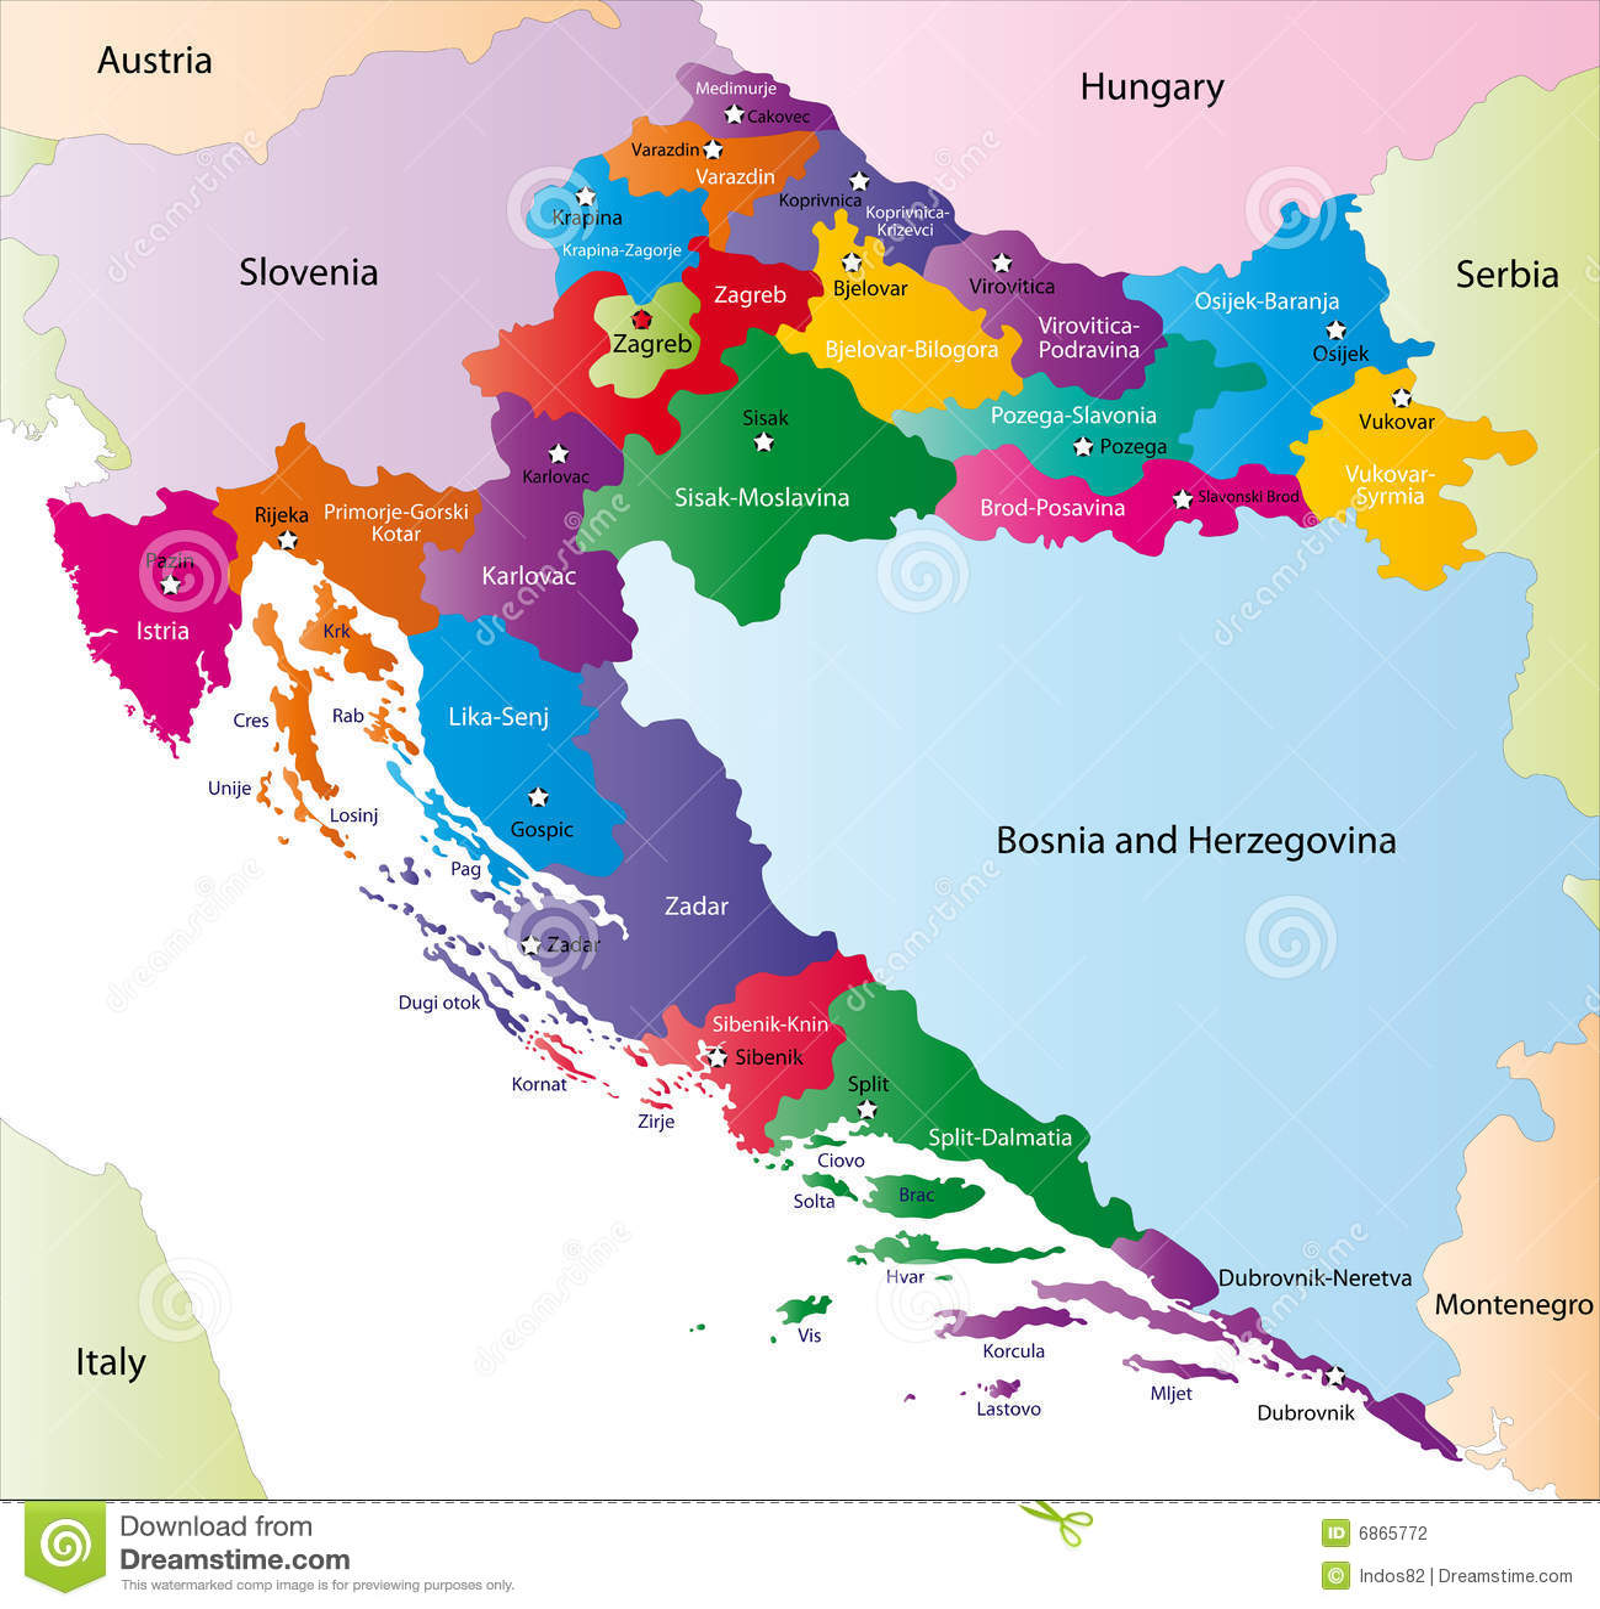 Carte Administrative Croatie.Carte De La Croatie Illustration De Vecteur Illustration Du